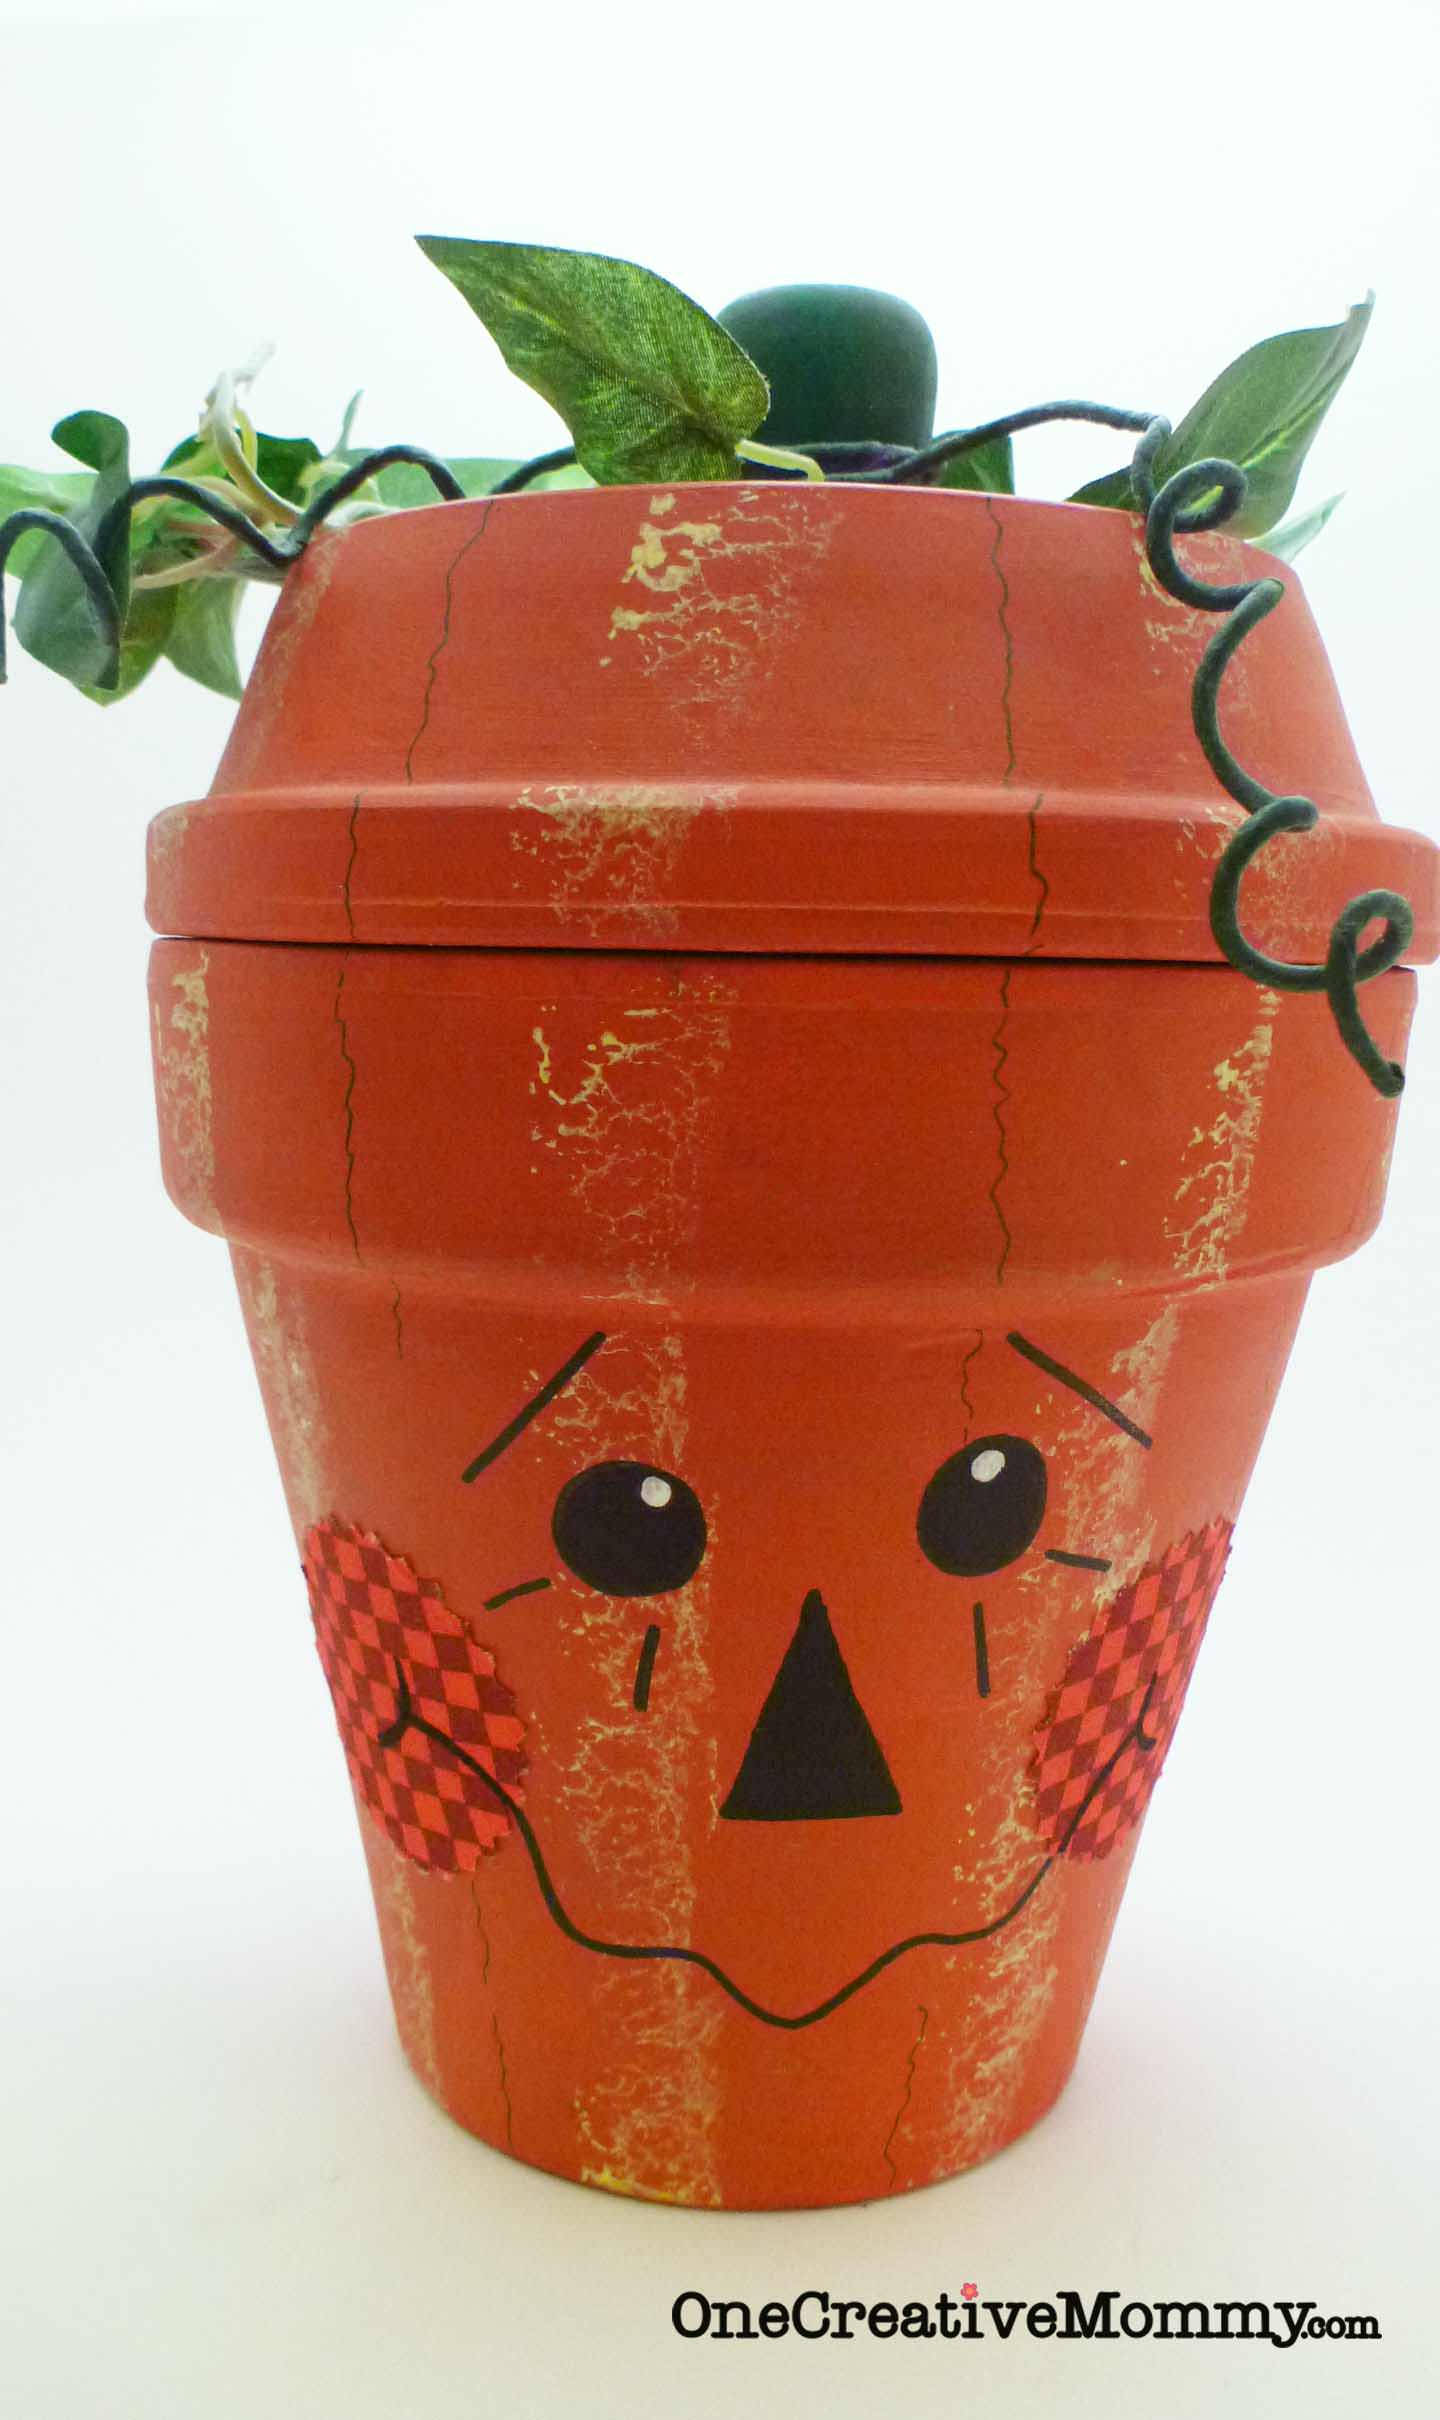 Fall Desktop Wallpaper With Pumpkins 11 Spooky Halloween Diy Crafts Available Ideas